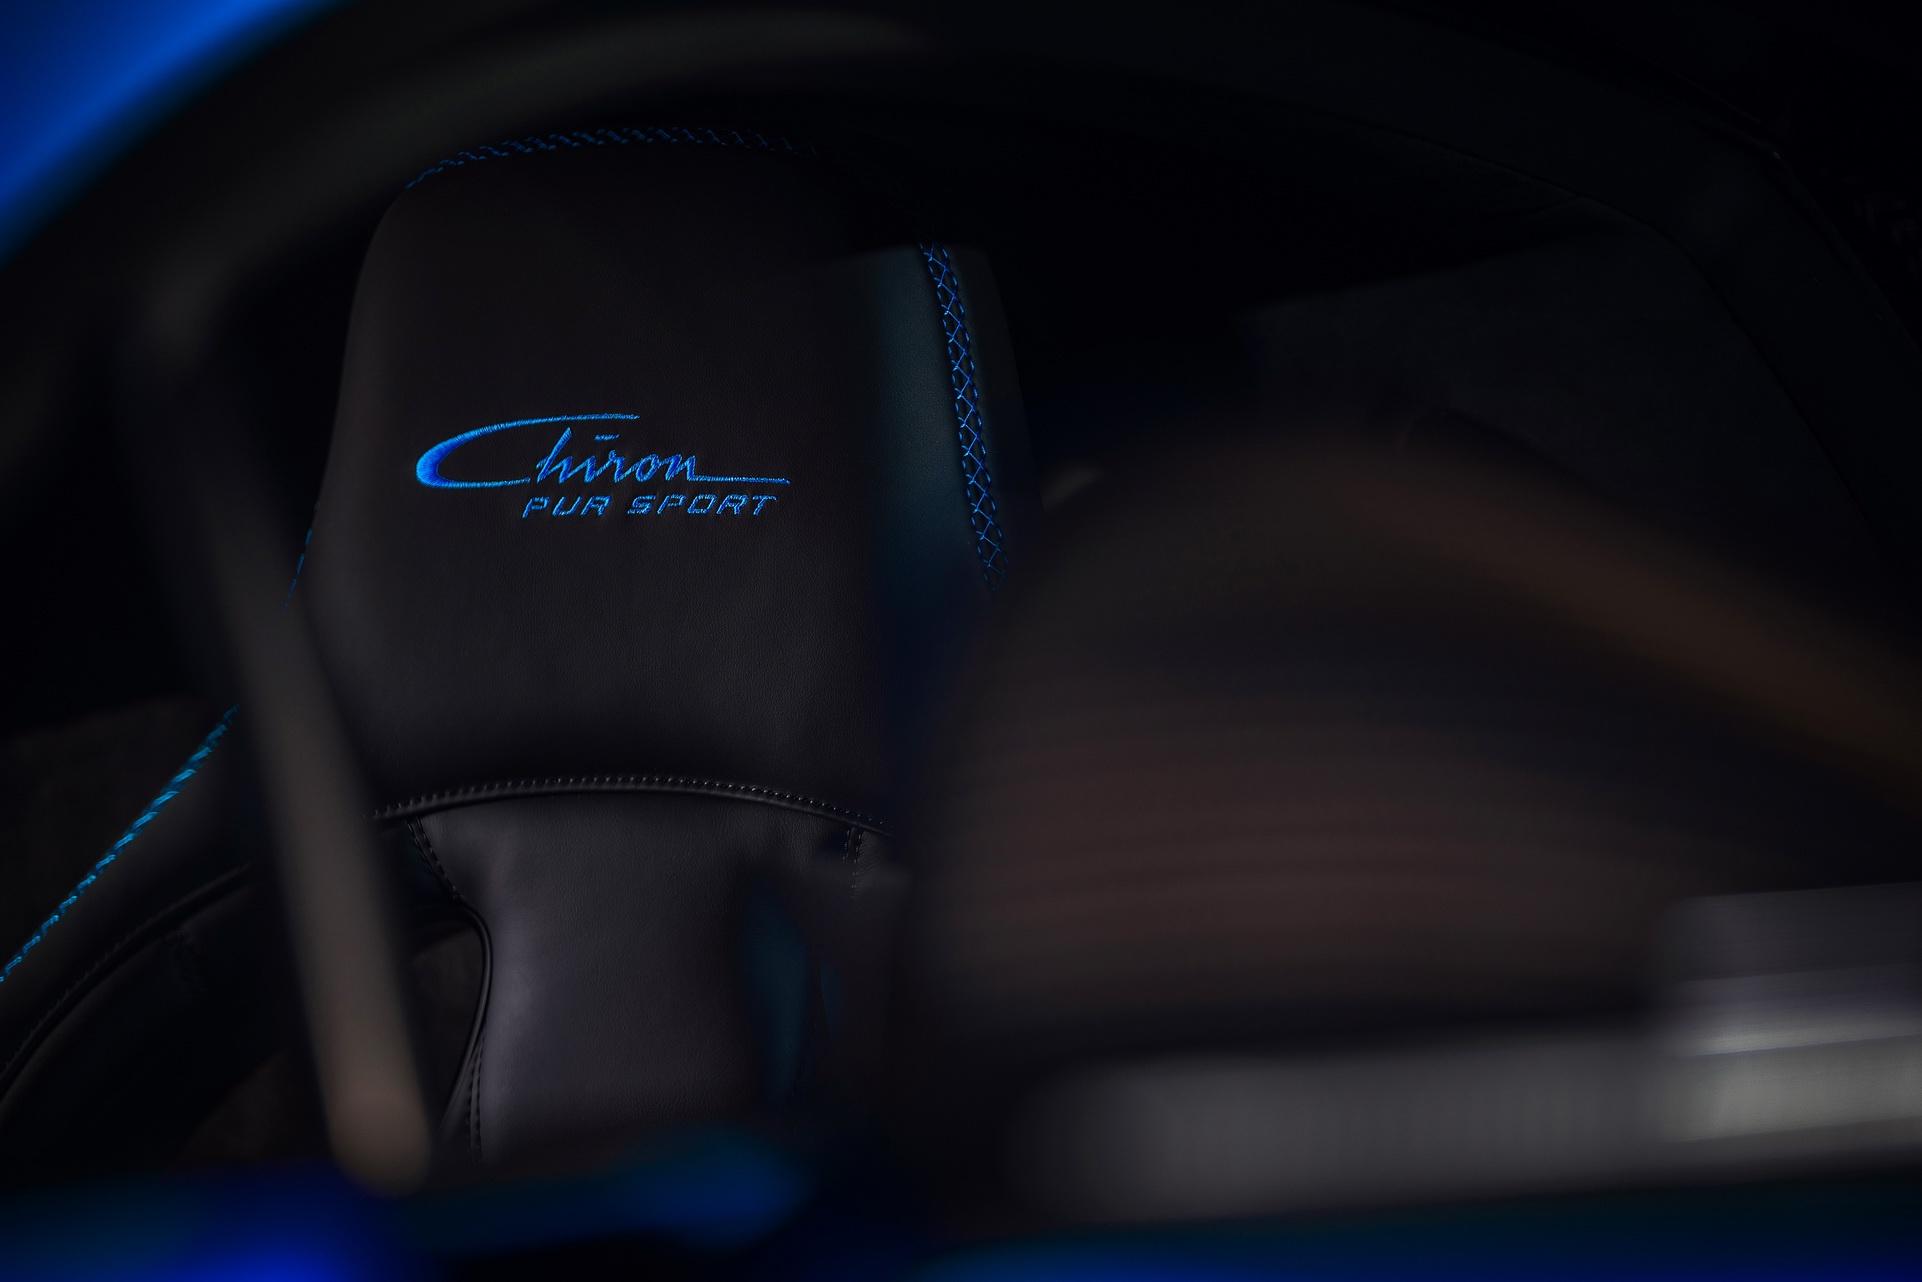 Bugatti Chiron phien ban moi ra mat - sieu xe gia 3,55 trieu USD hinh anh 25 C4.jpg